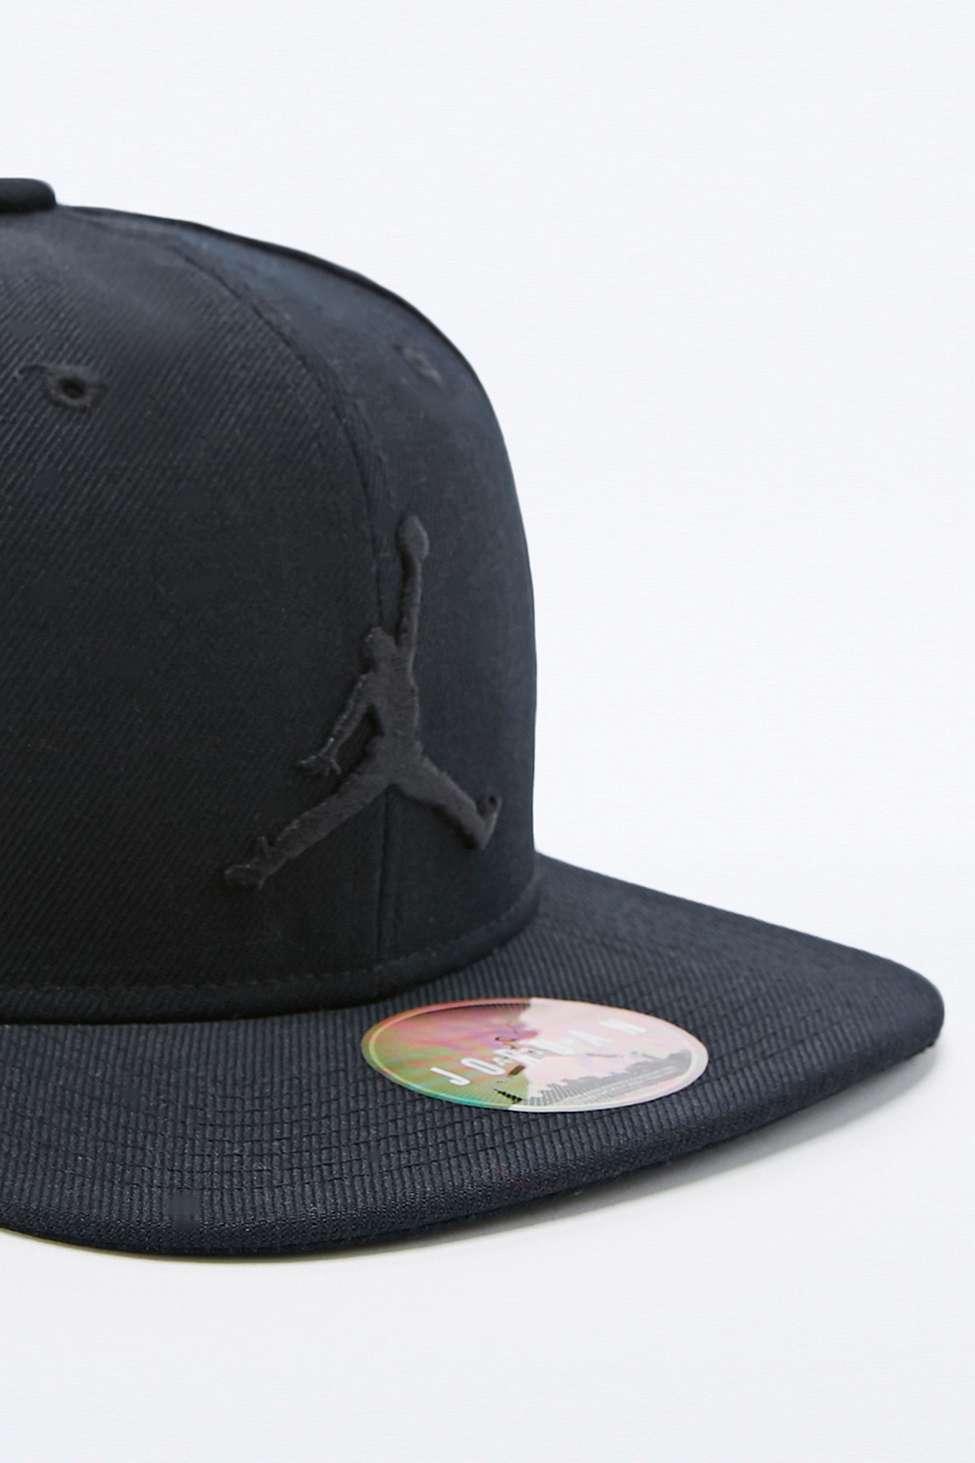 7357aad4694 ... 861452 013 mens ladys e243f 36dab  order nike jordan jumpman snapback  cap in black in black for men lyst a5869 b6cb7